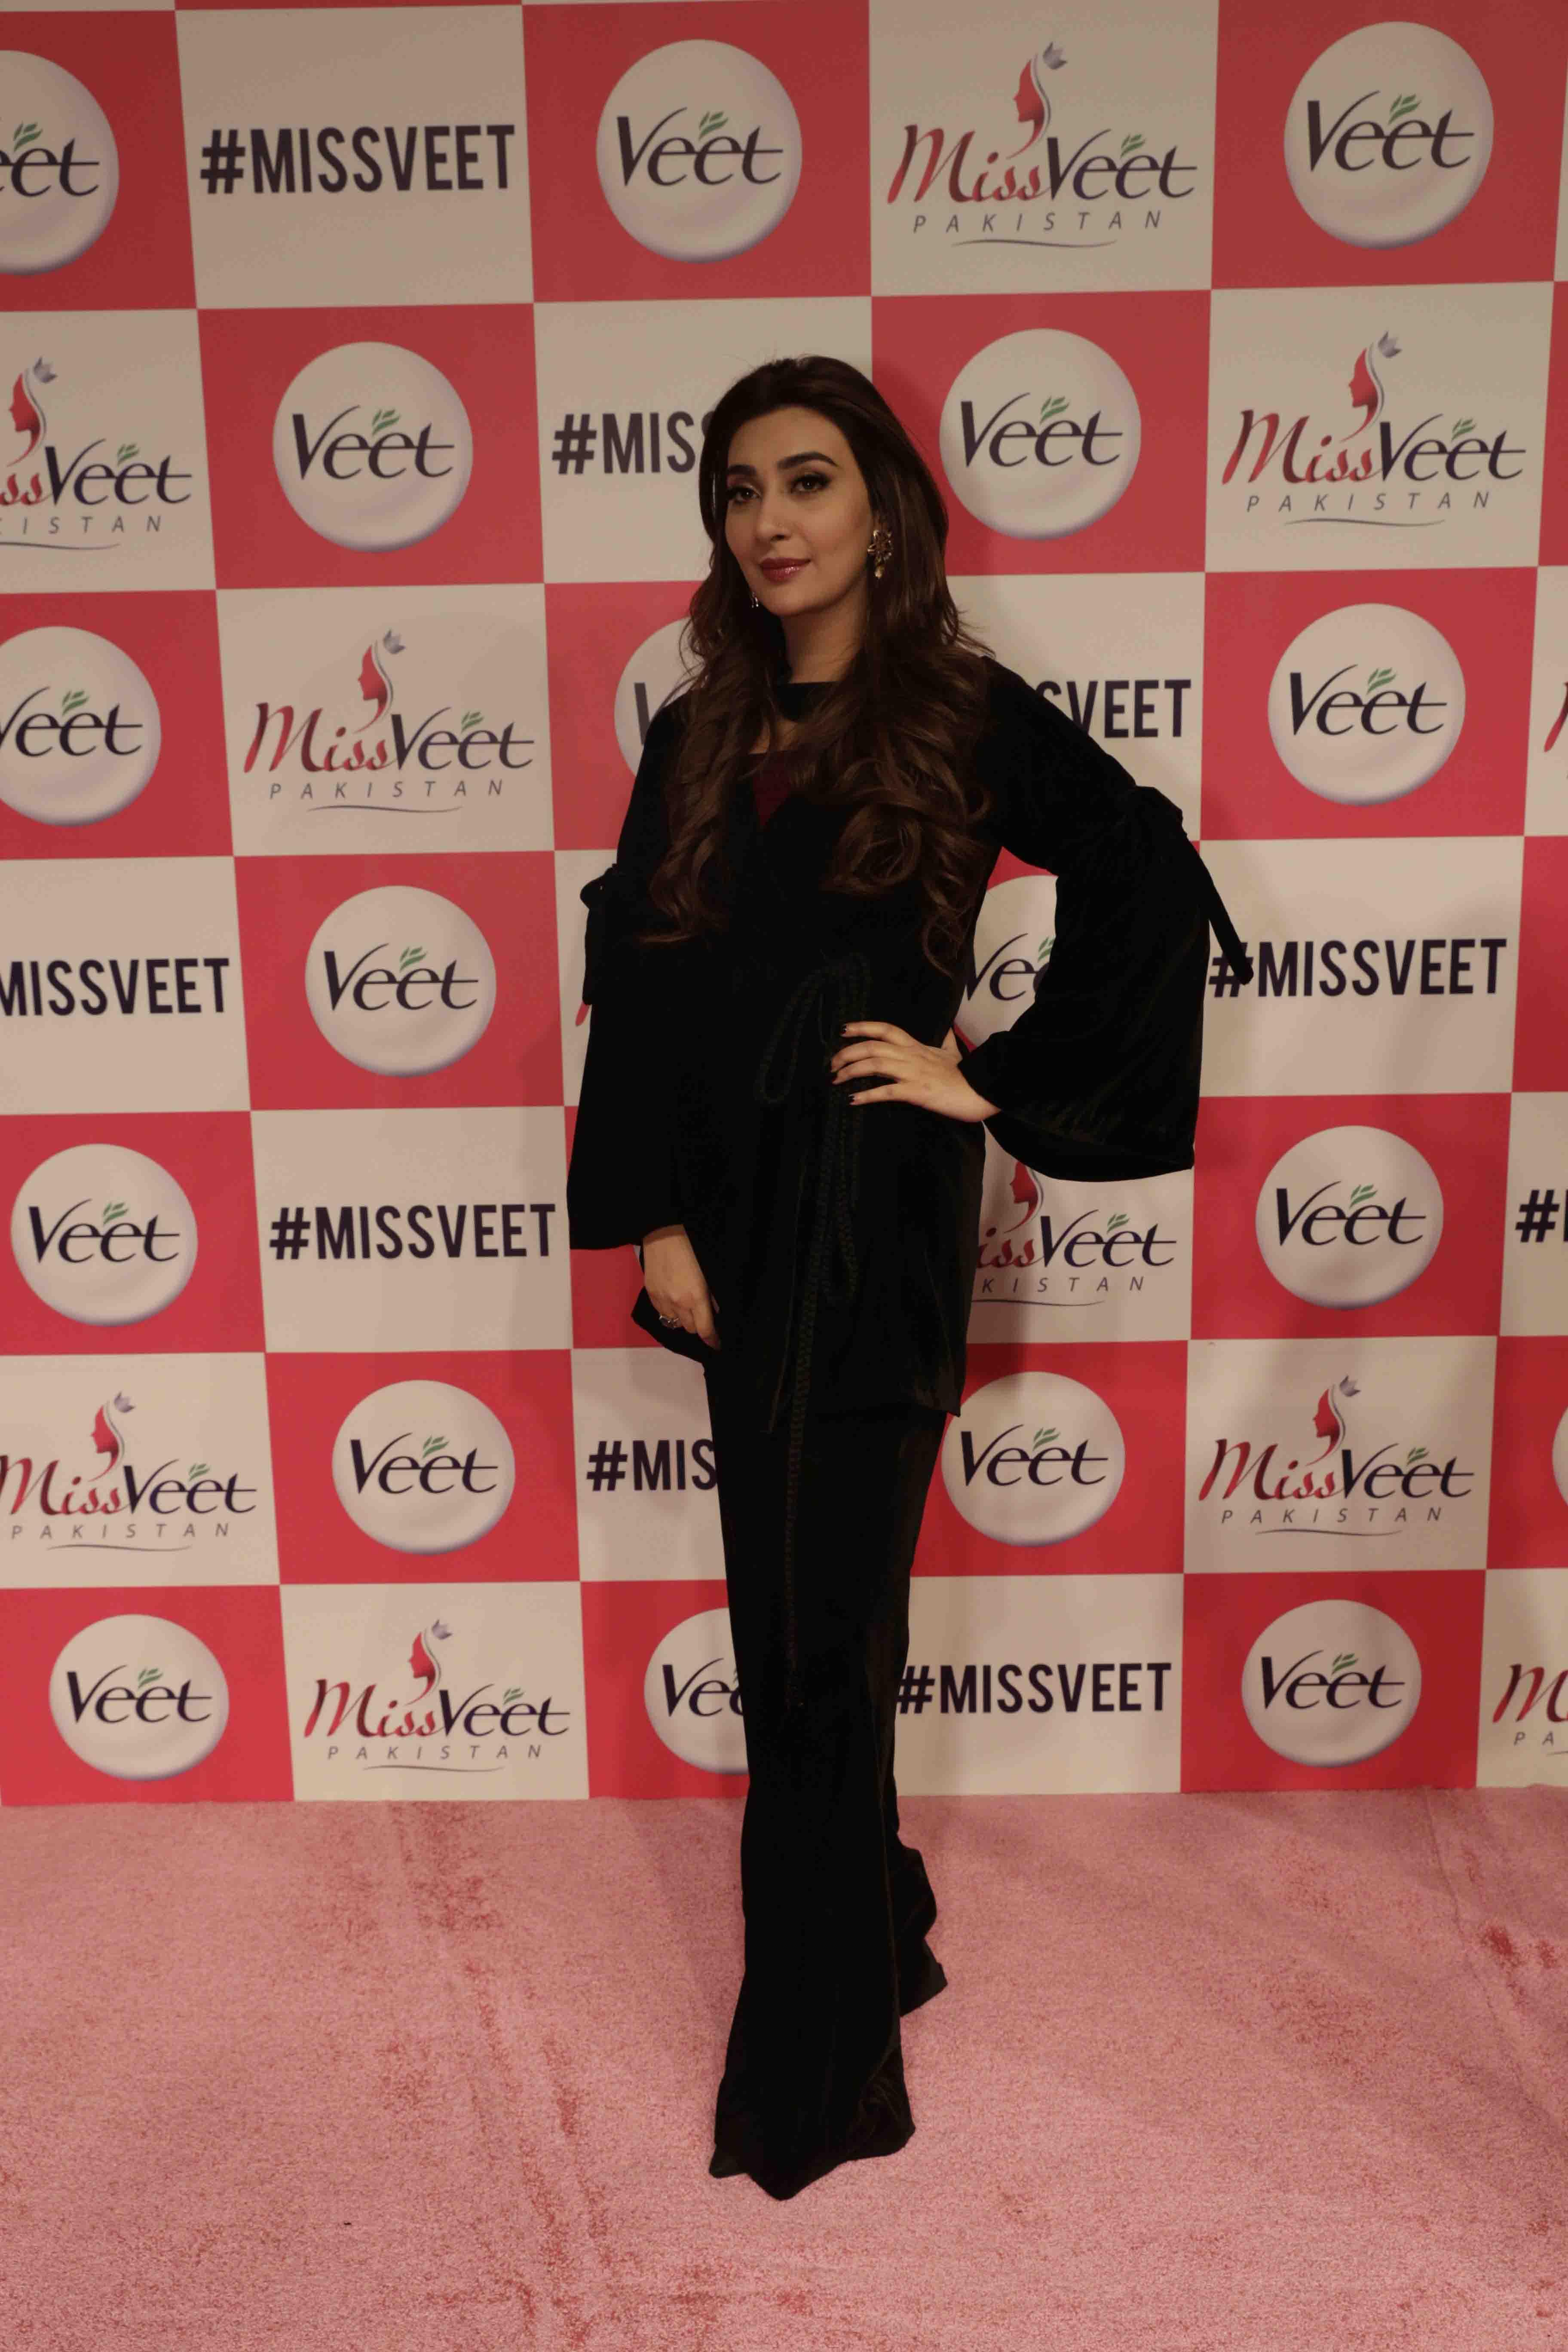 press-release-miss-veet-pakistan-2016-winner-crowned-2